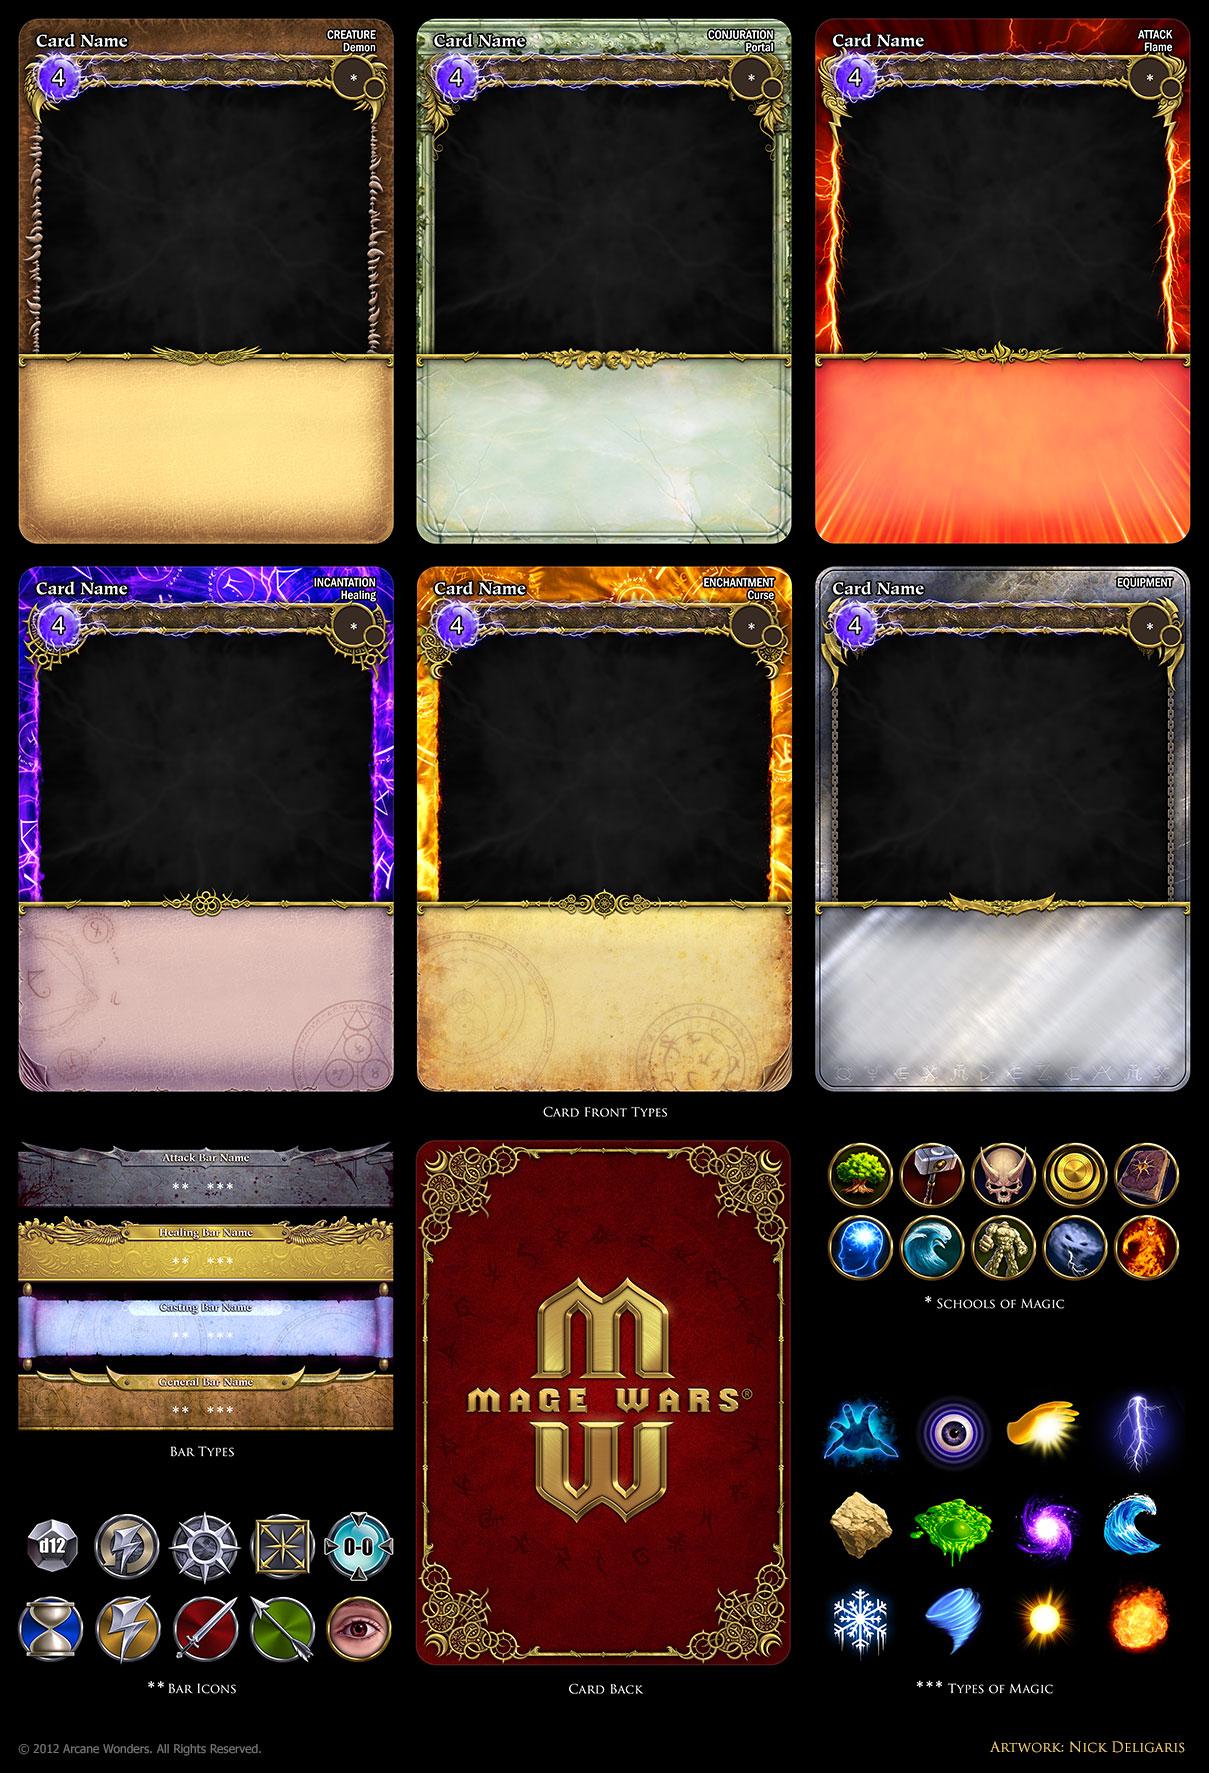 Mage Wars - card assets